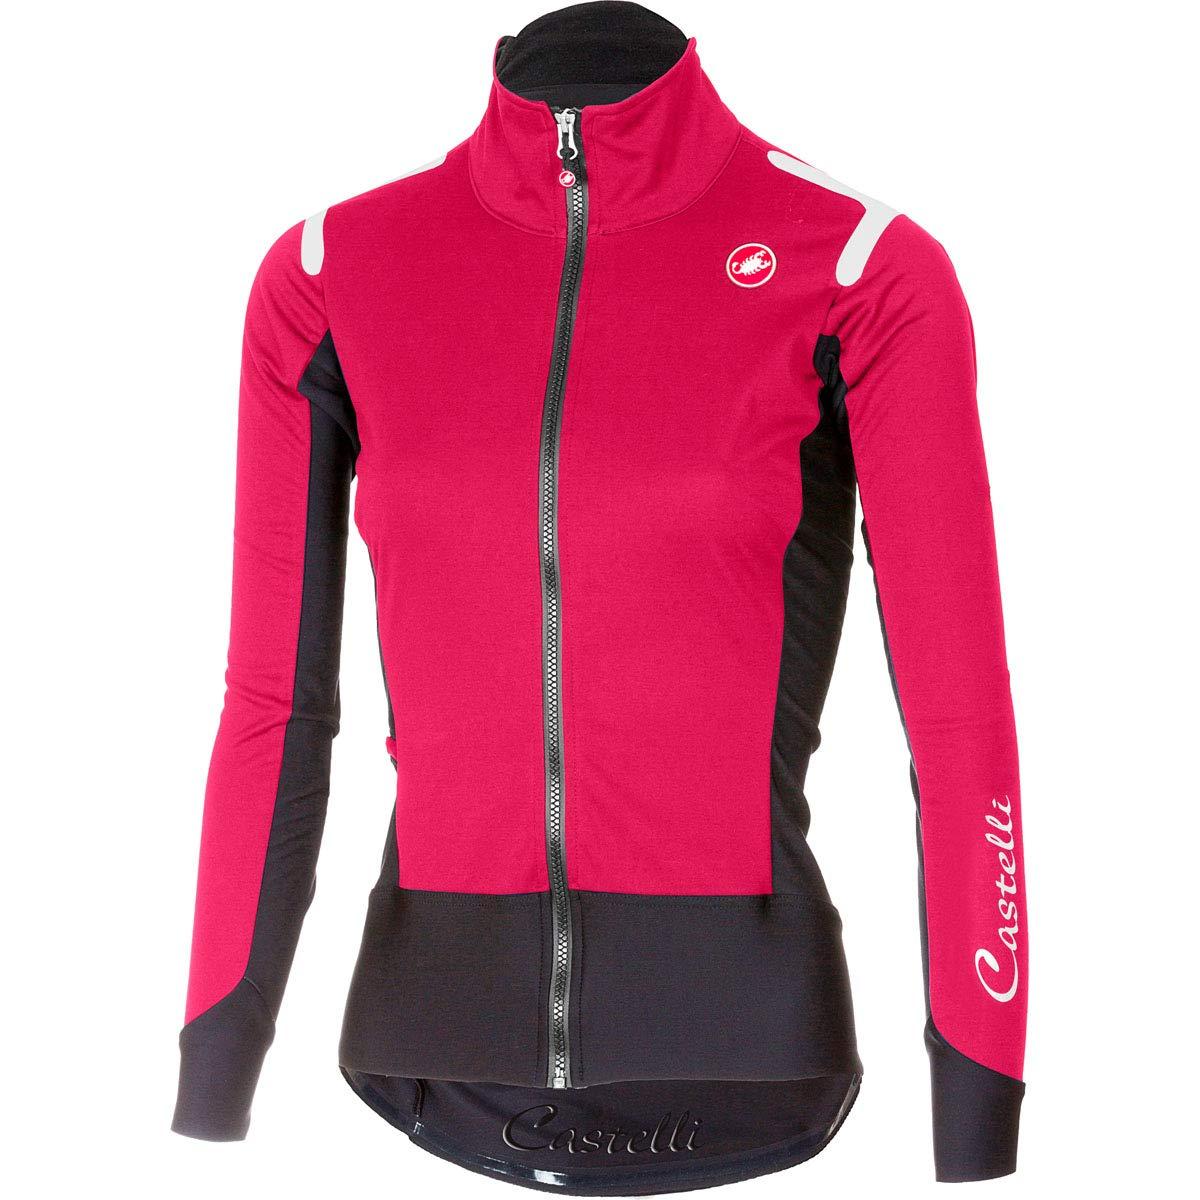 A17539 Castelli 2017 Womens Alpha Ros Long Sleeve Cycling Jersey